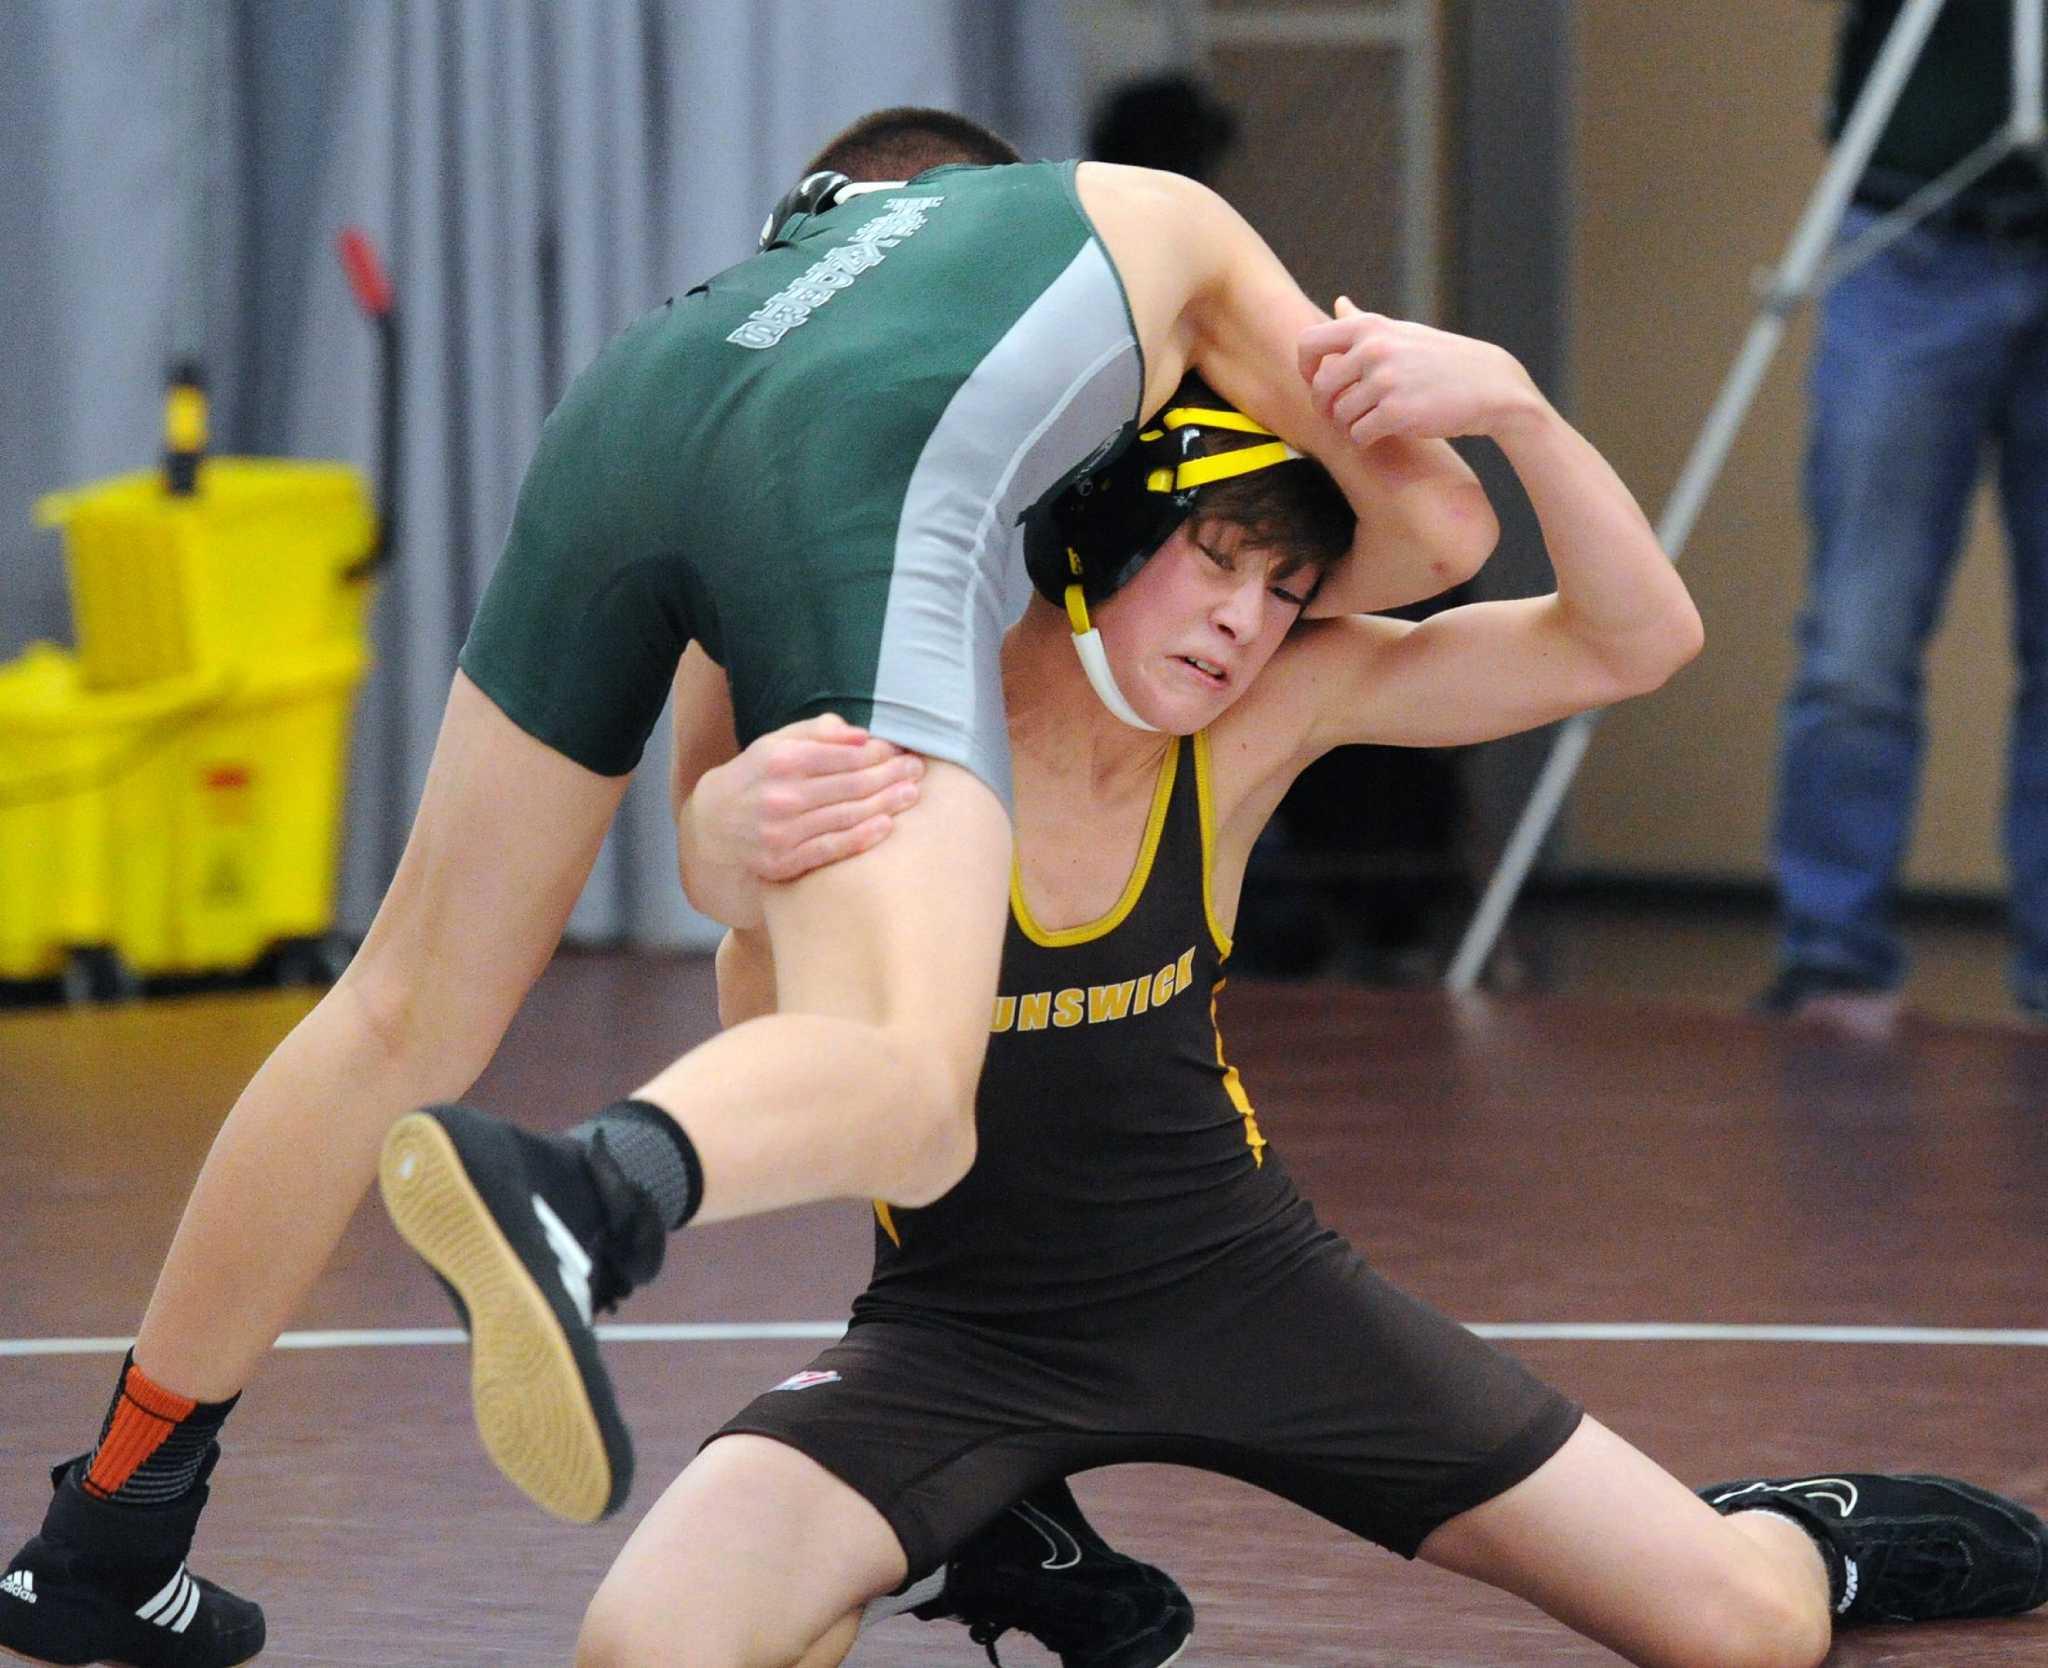 brunswick wrestling team defeats chase collegiate greenwichtime